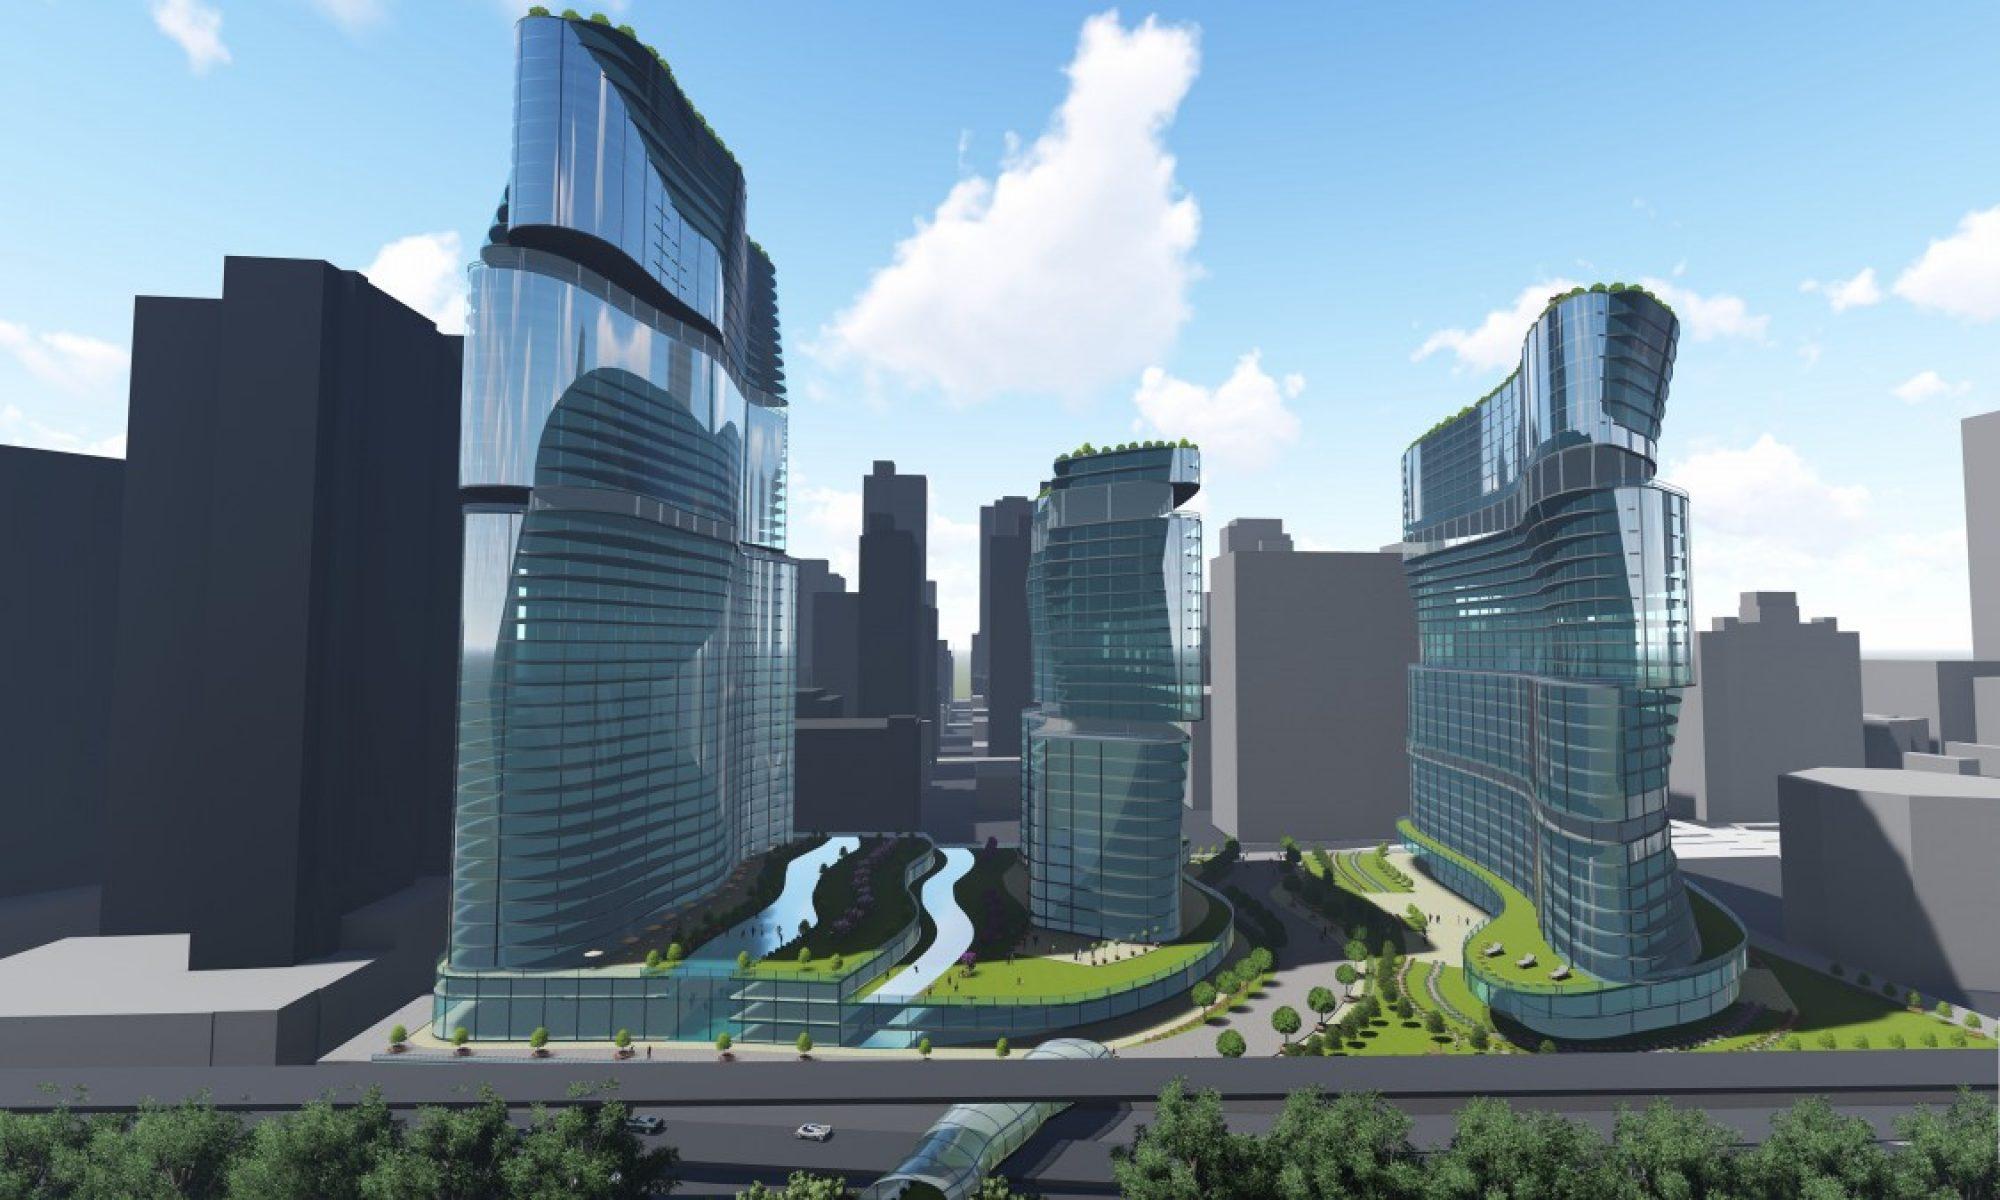 ARCH 4710 Urban Design